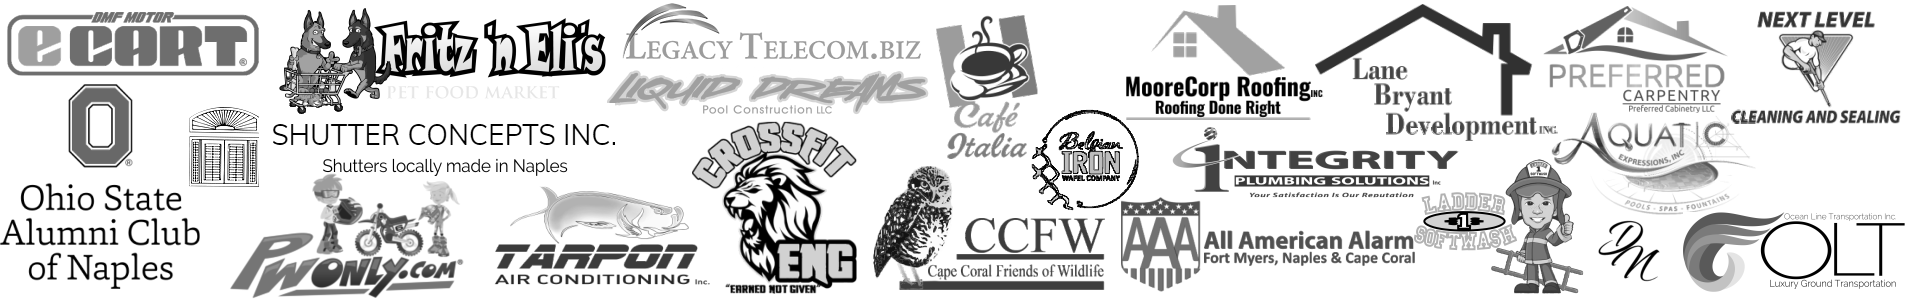 2020 Clietn Logos wide1